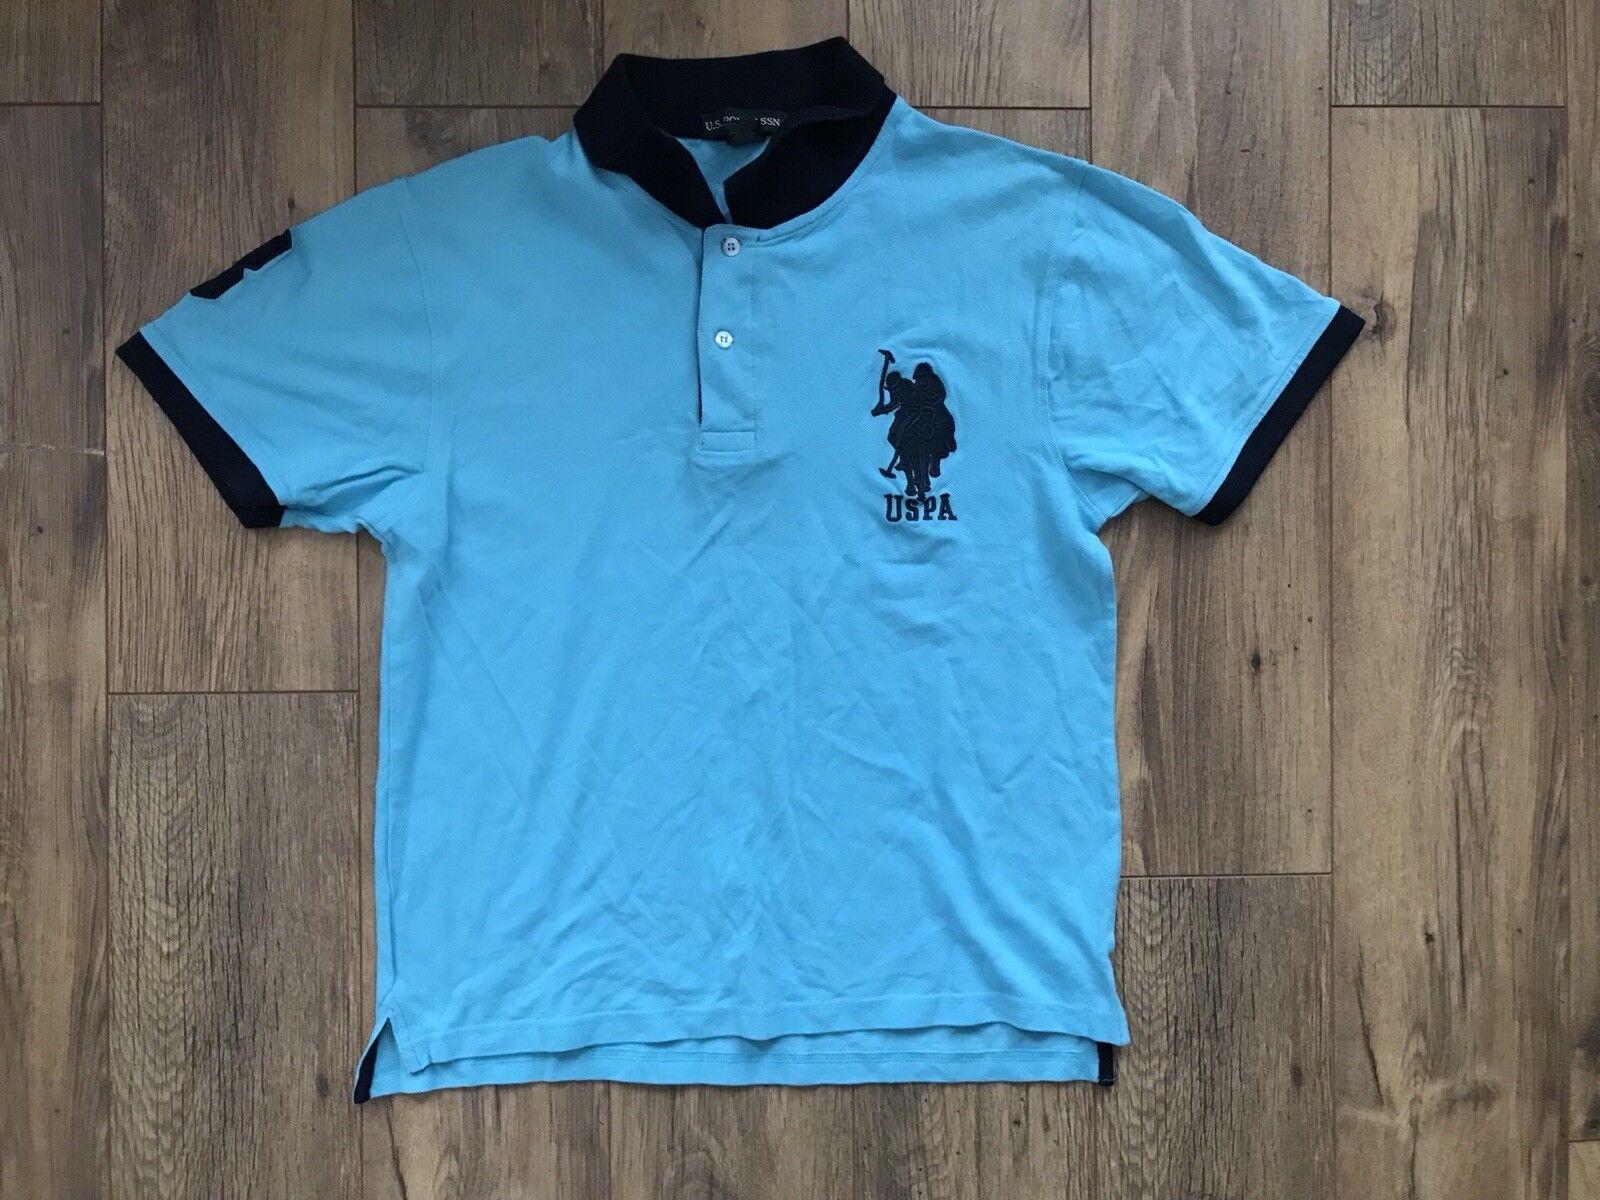 Polo bluee T-shirt Size L